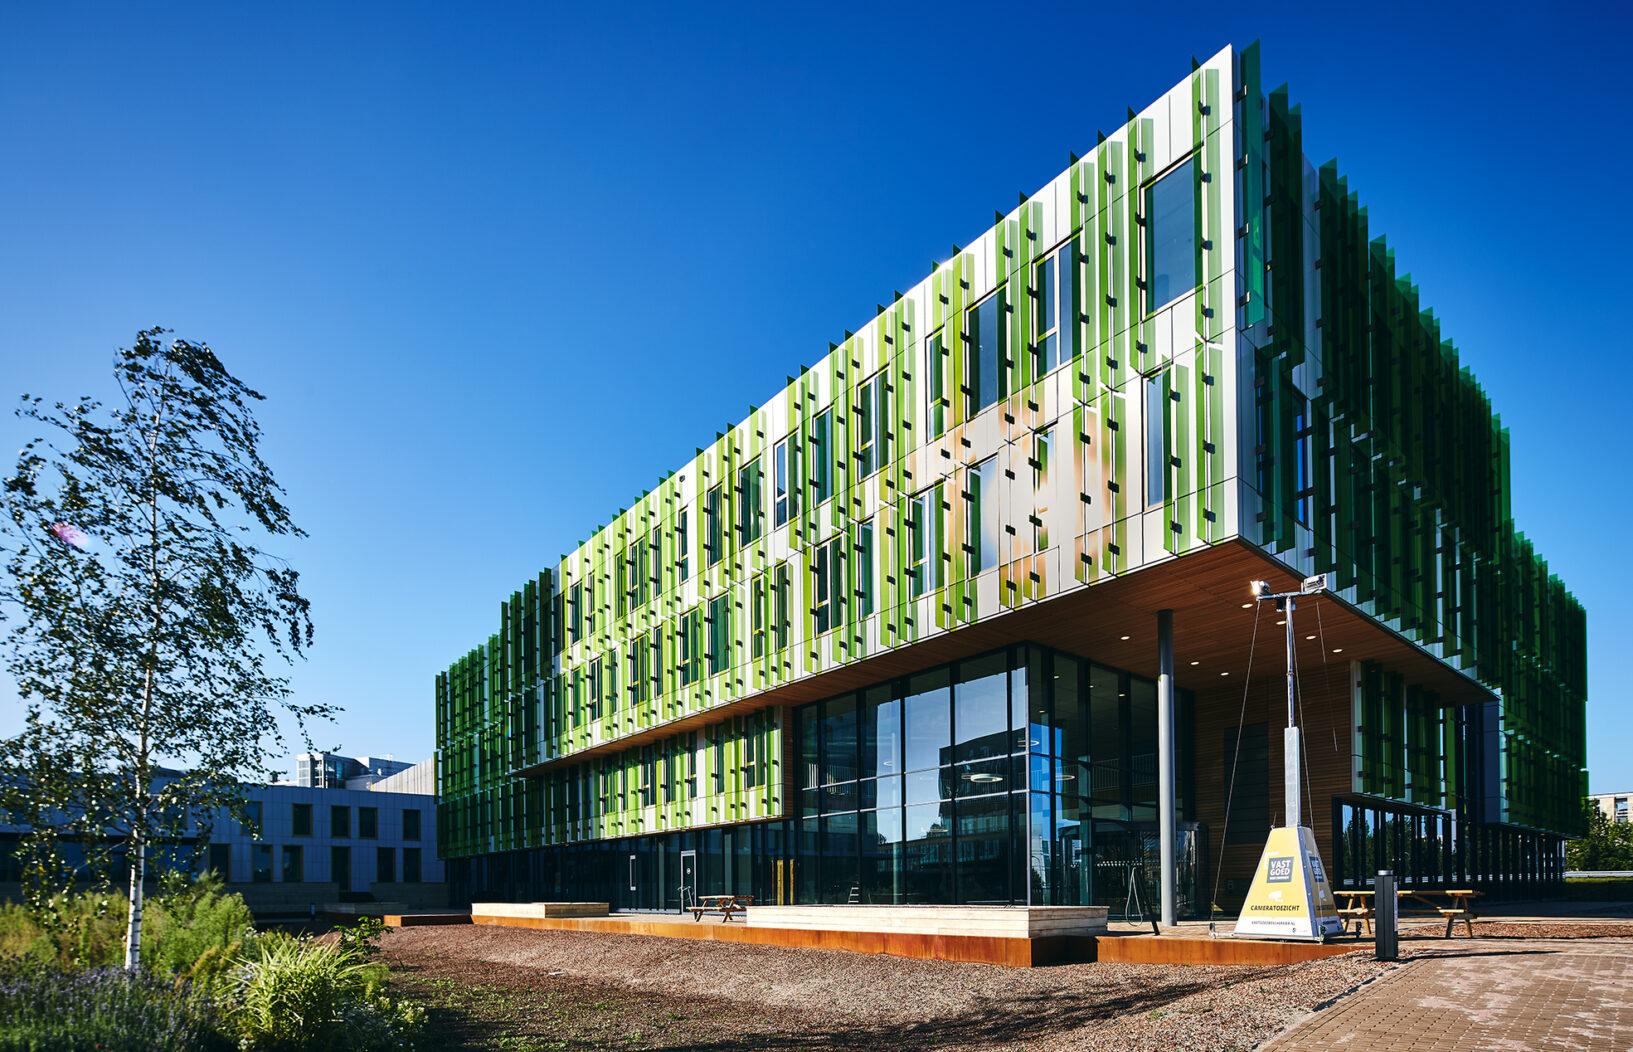 Design: William McDonough + Partners and N3O architecten